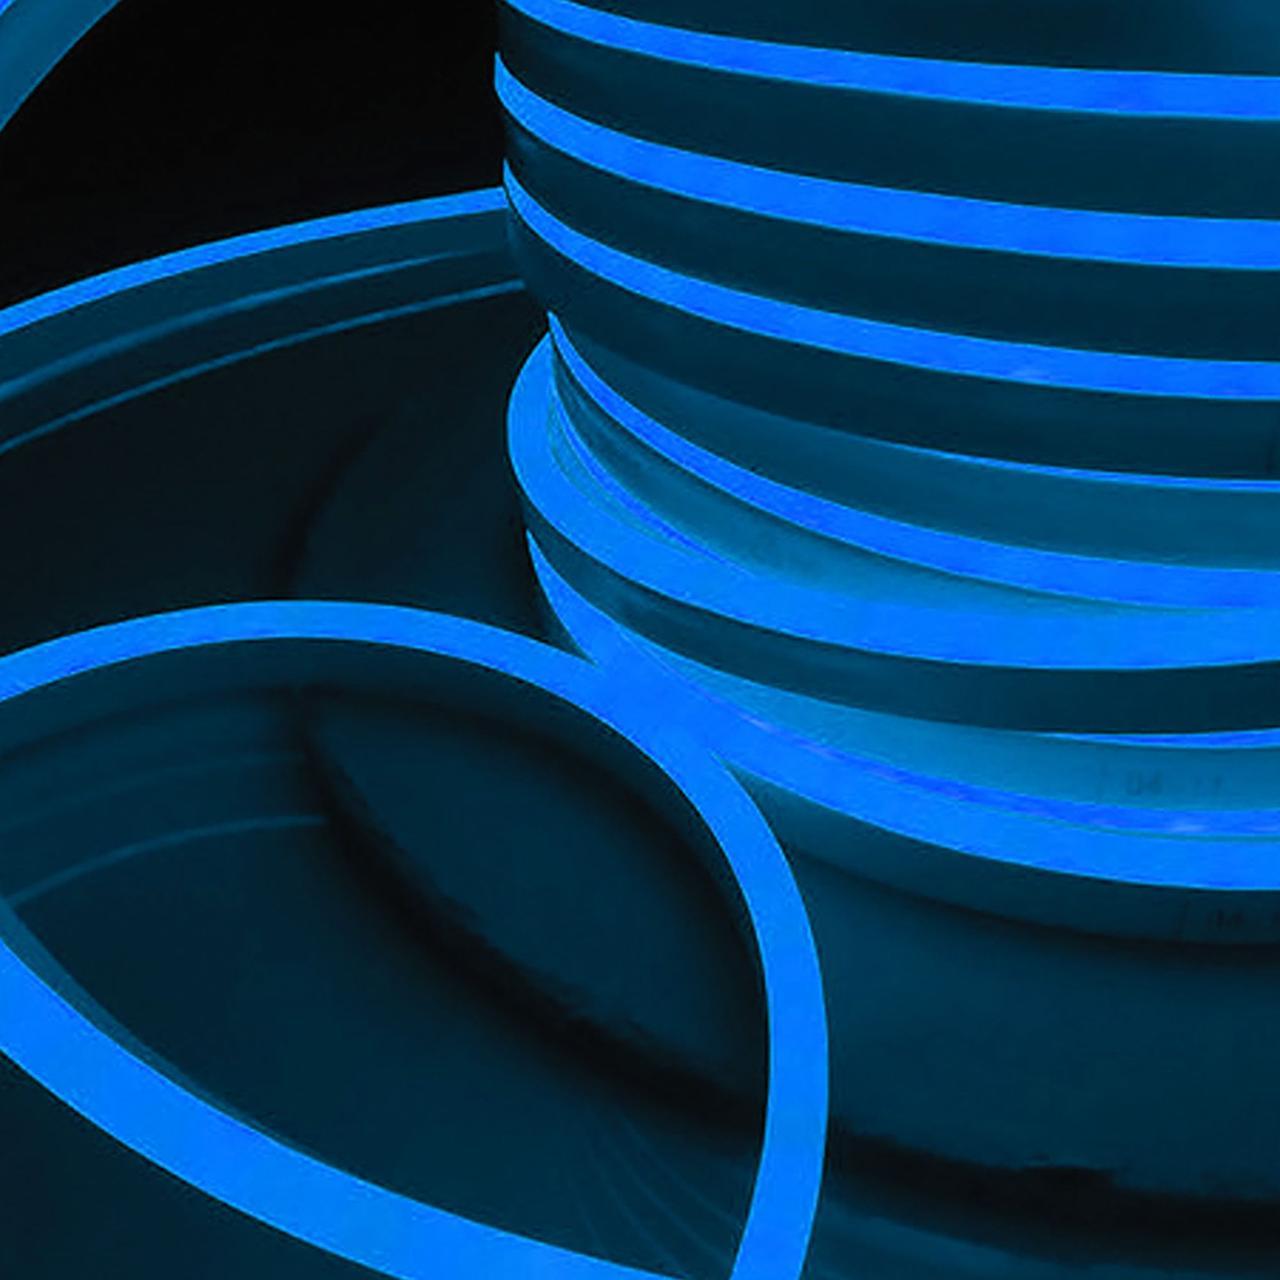 Гибкий светодиодный Неон уличный LTL FLEX 8Х16мм 120 LED 2835SMD IP67 220V синий